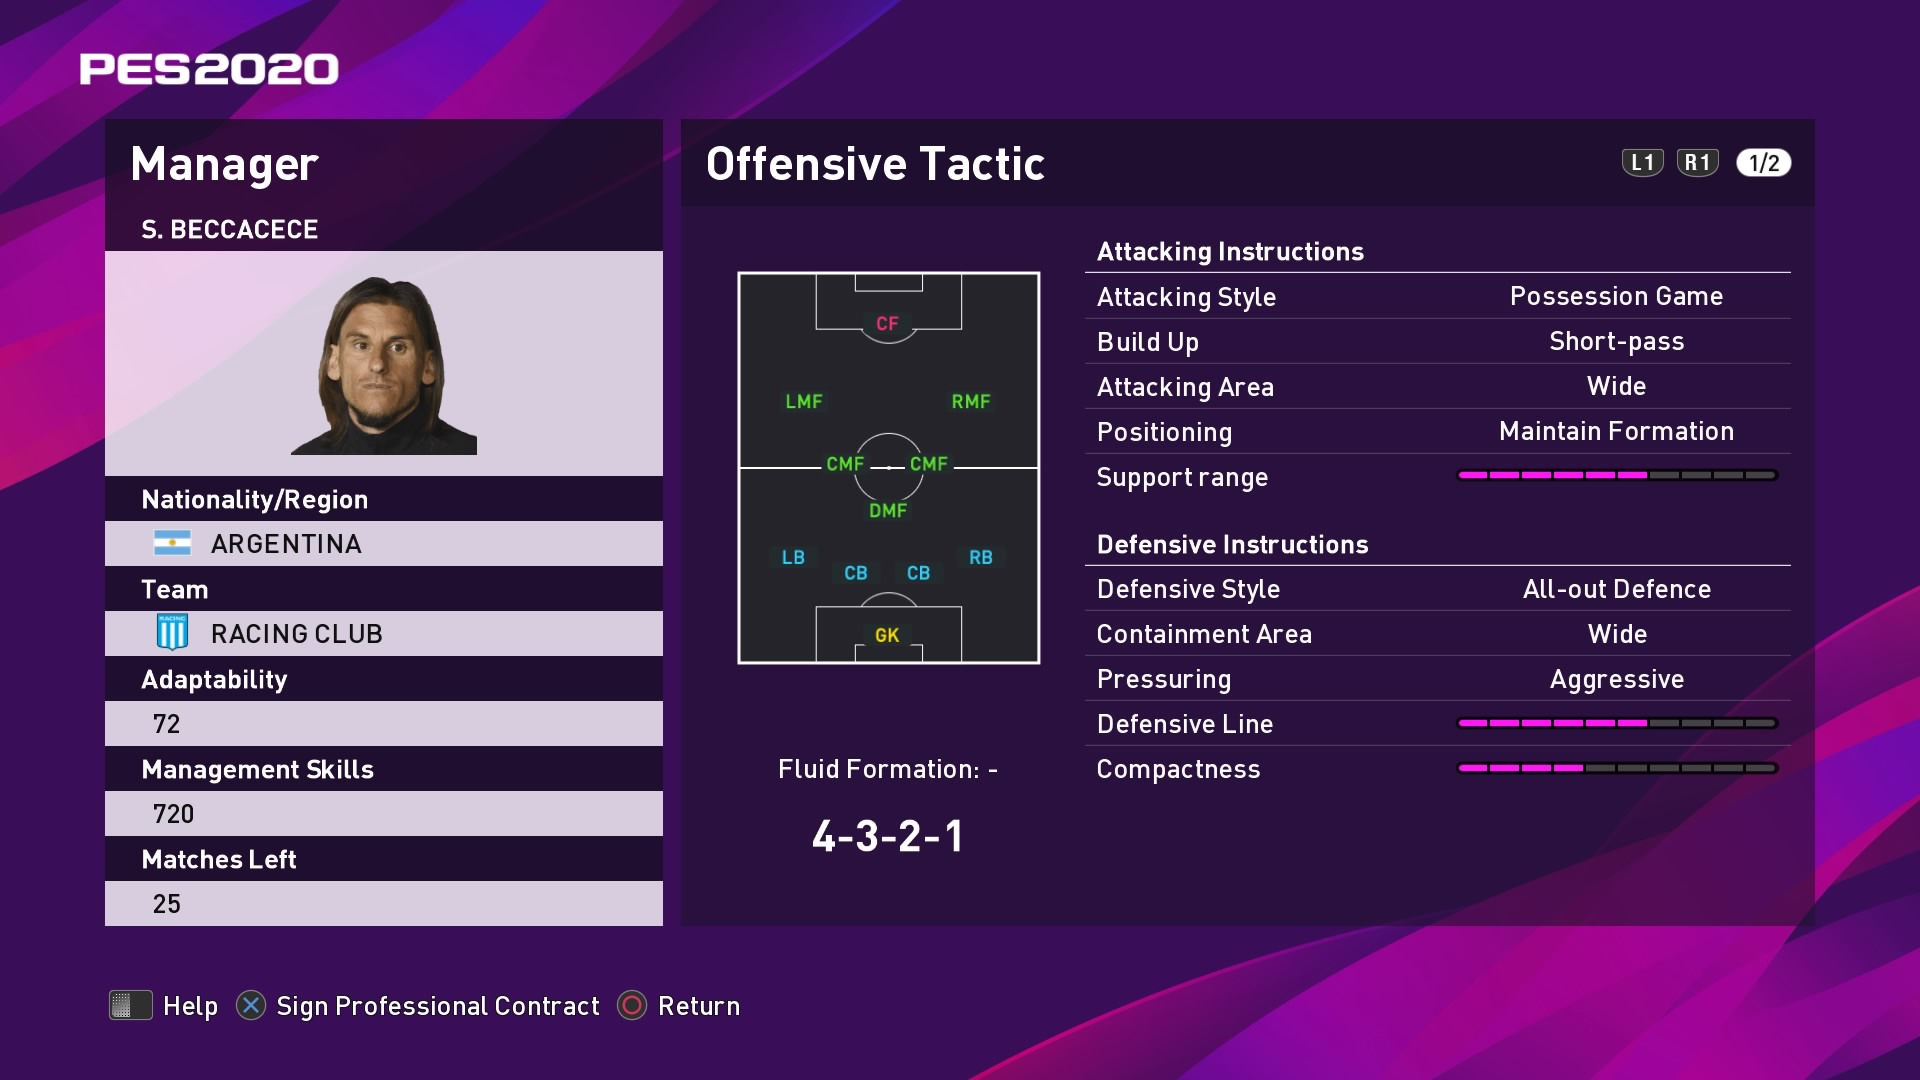 S. Beccacece (Sebastián Beccacece) Offensive Tactic in PES 2020 myClub